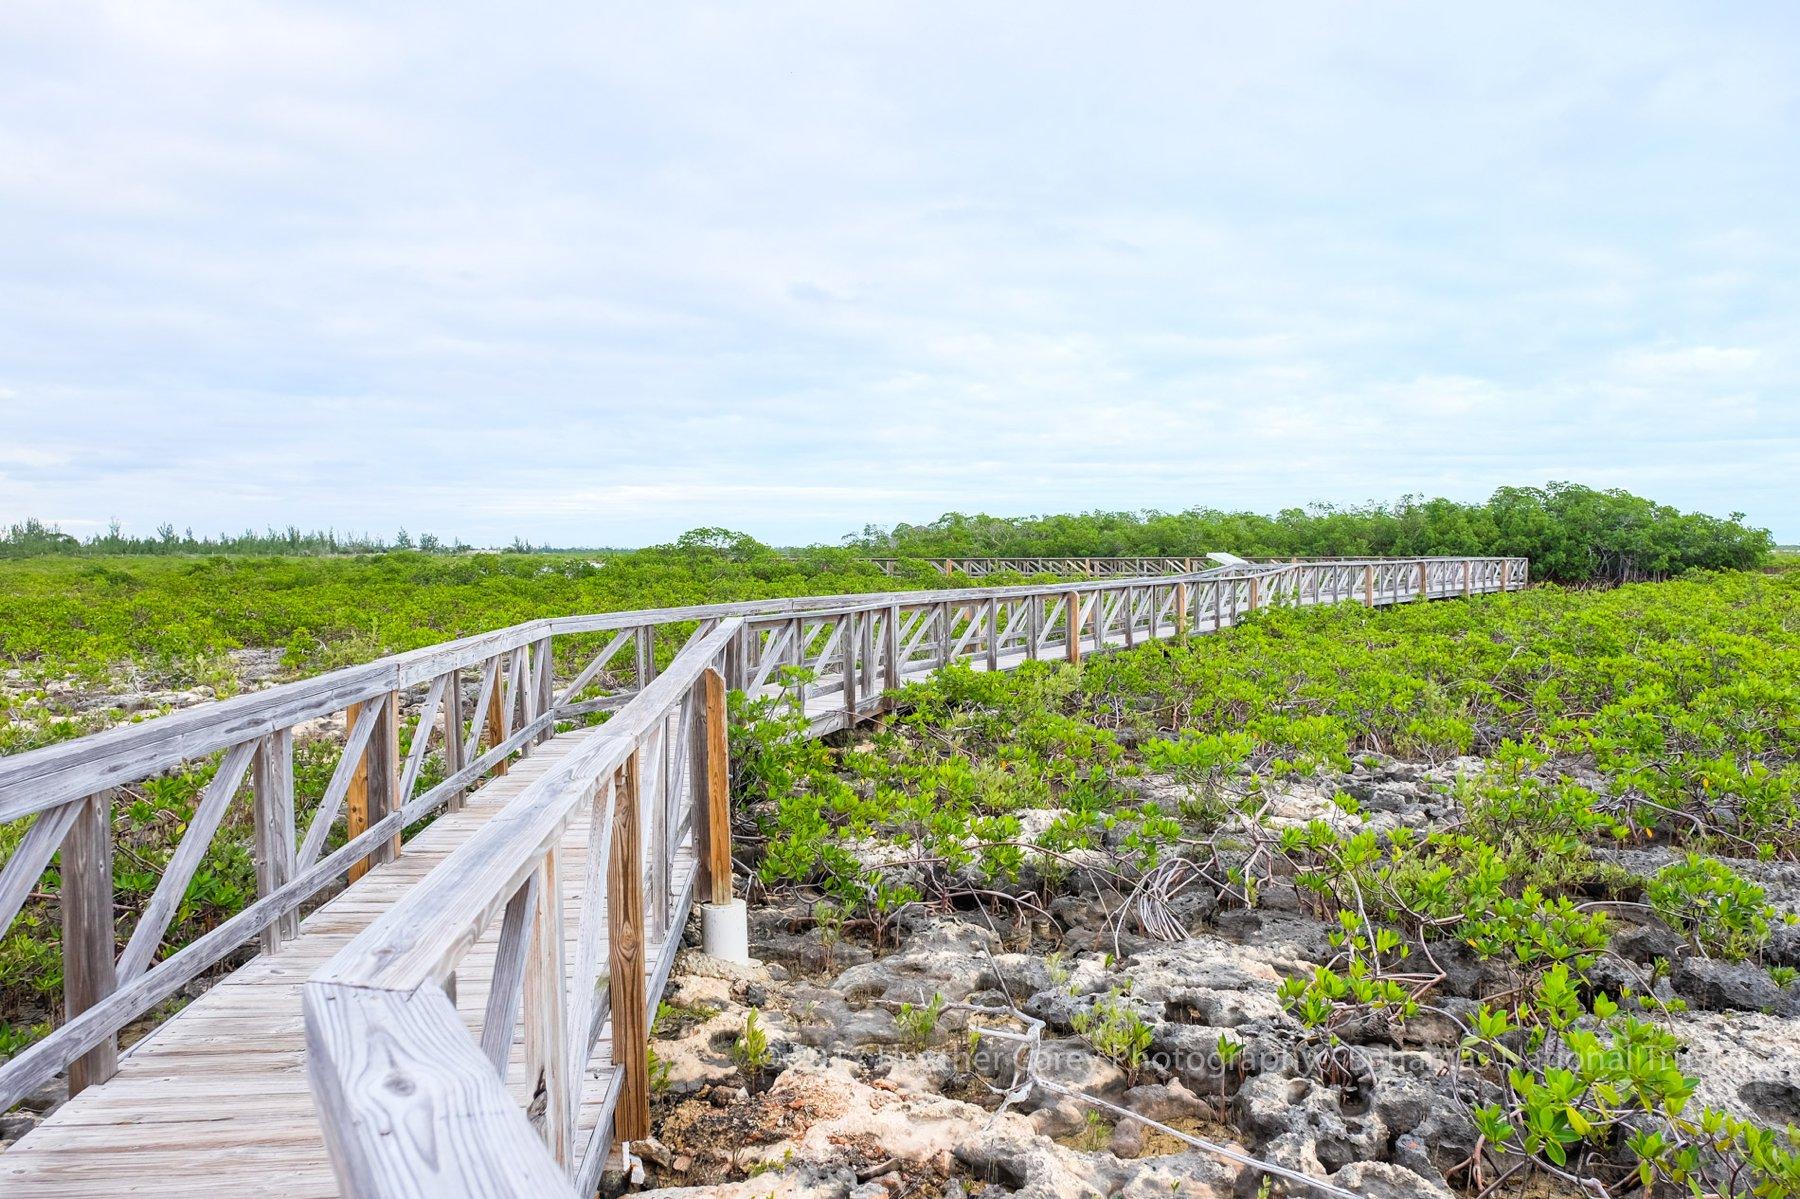 rotary bahamas and bahamas national trust mangrove planting bonefish pond national park barry rassin